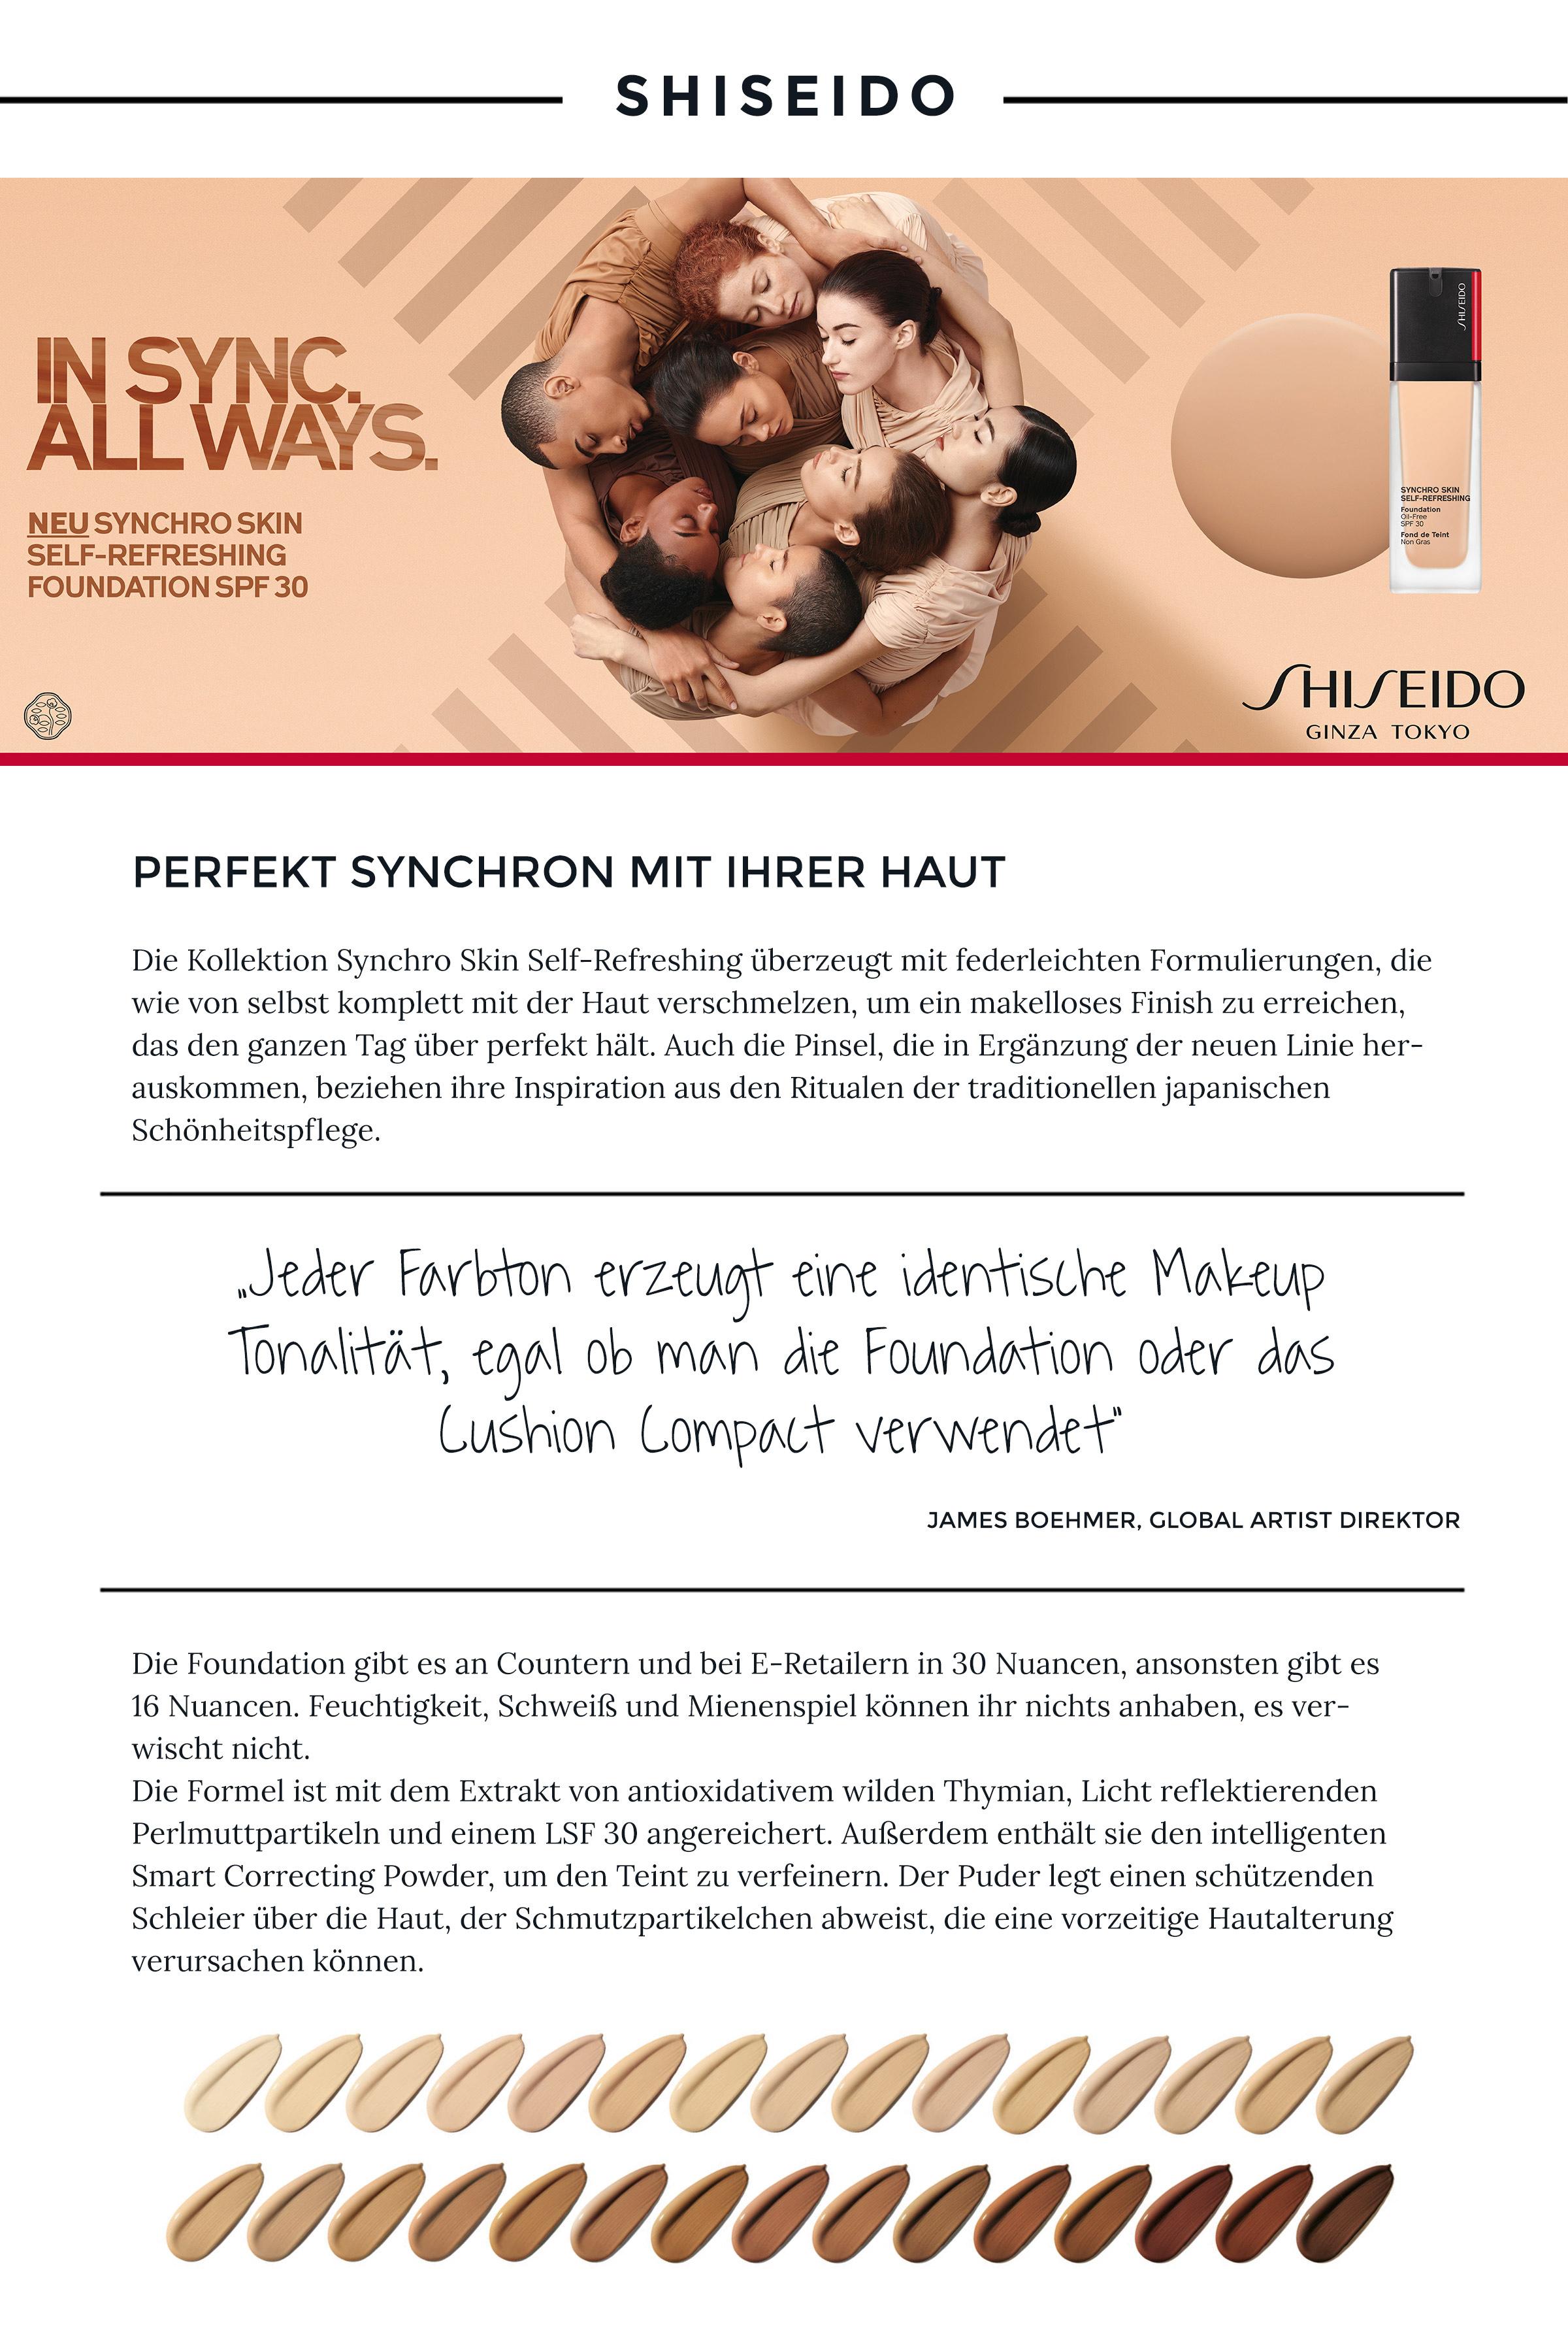 Promo_Shiseido_Foundation_Parfuemerie_meller